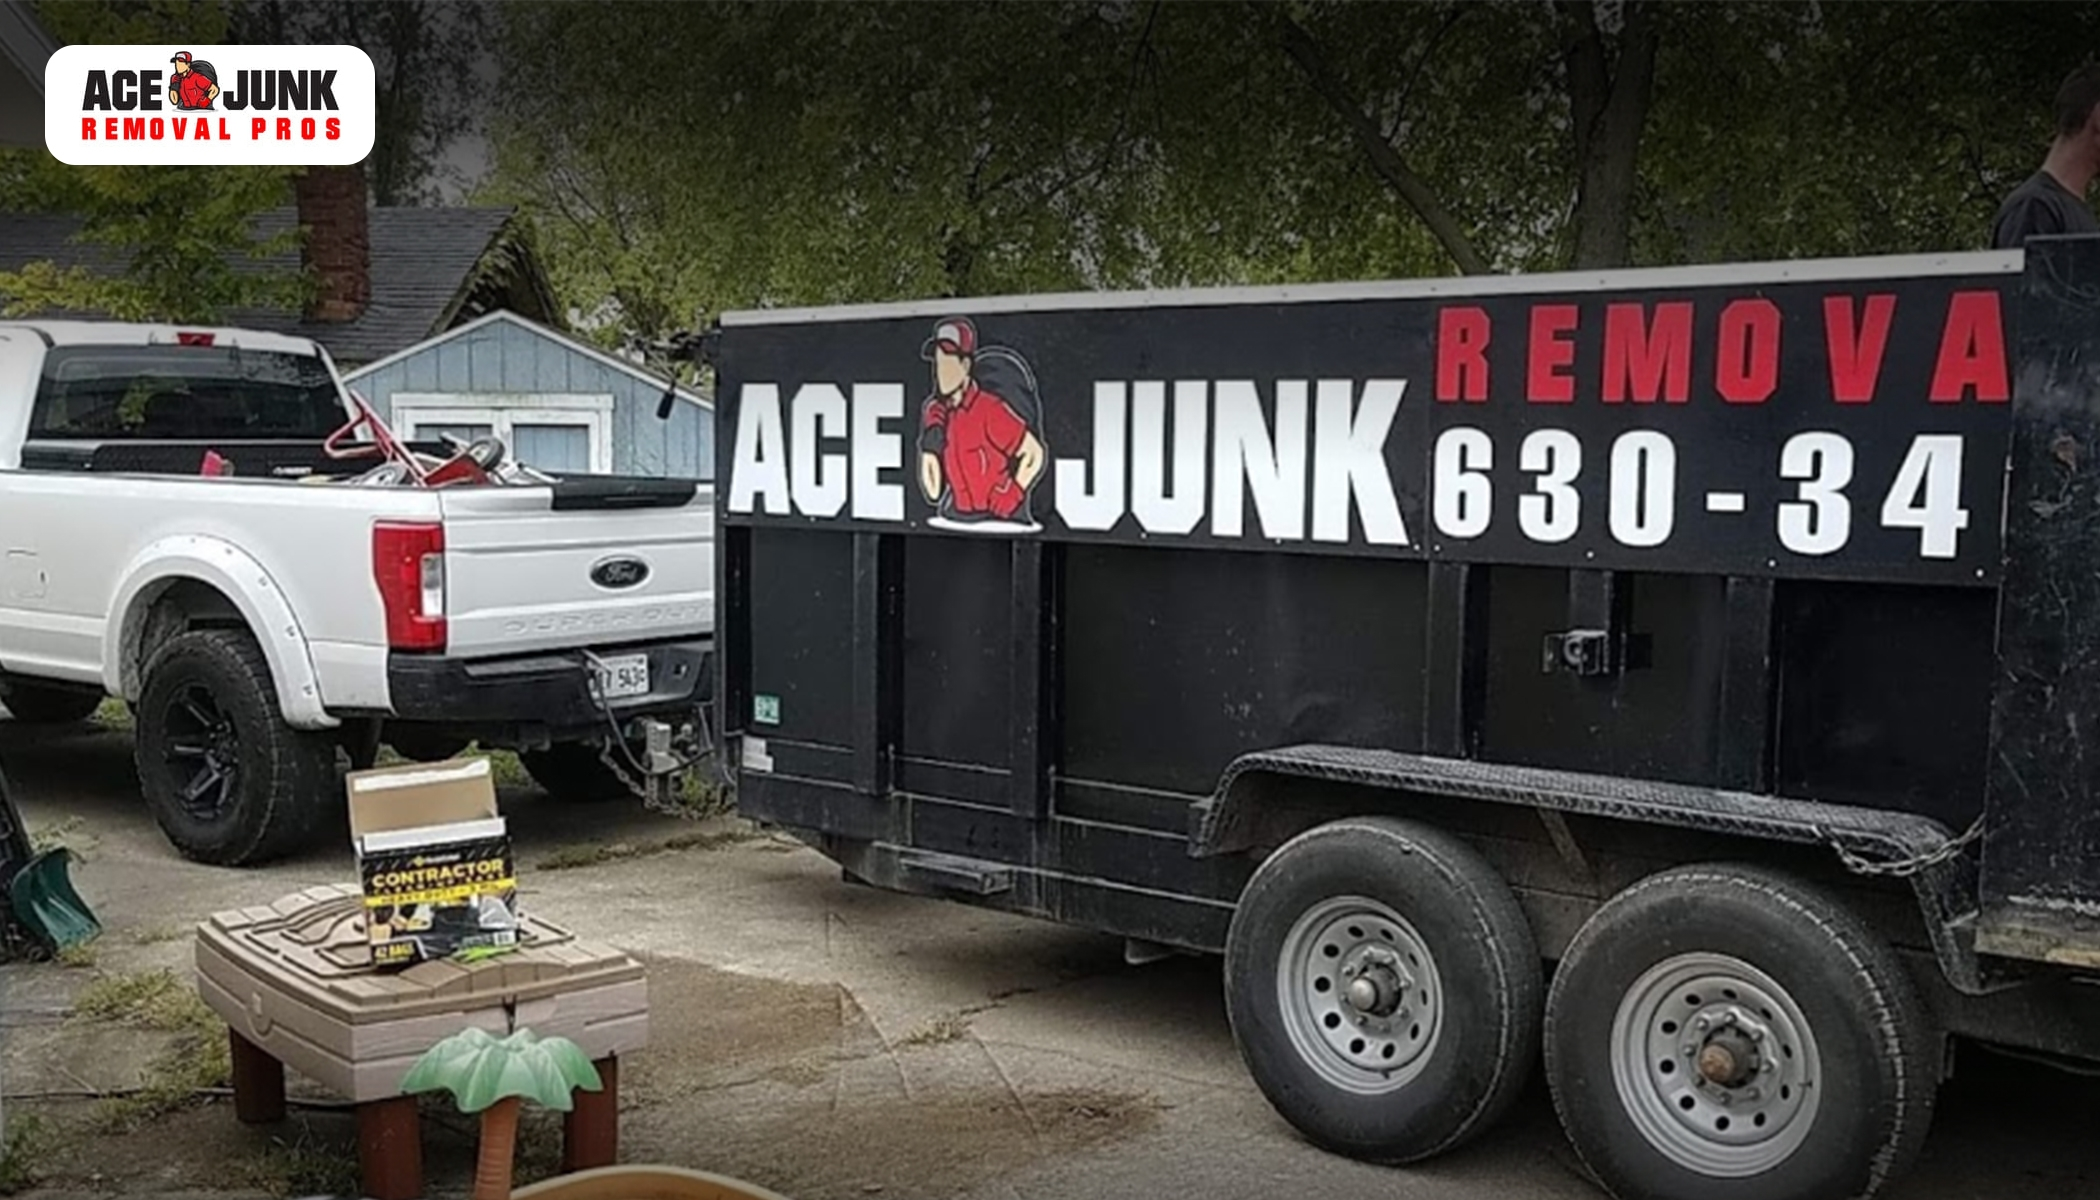 Ace Junk Removal Pros (@acejunkhaul) Cover Image